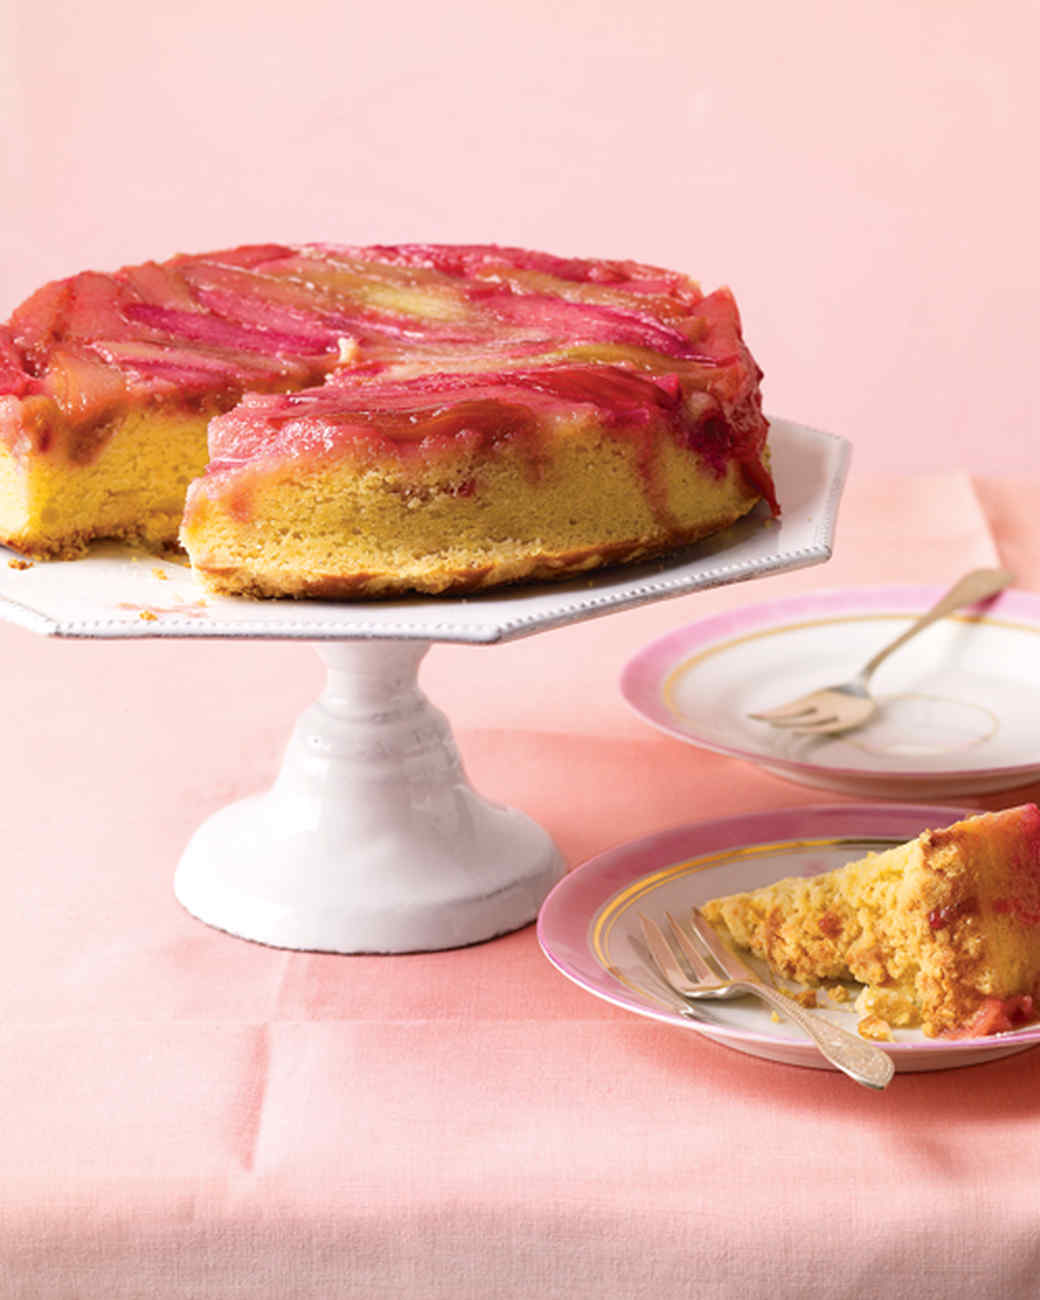 Martha stewart cake recipe book